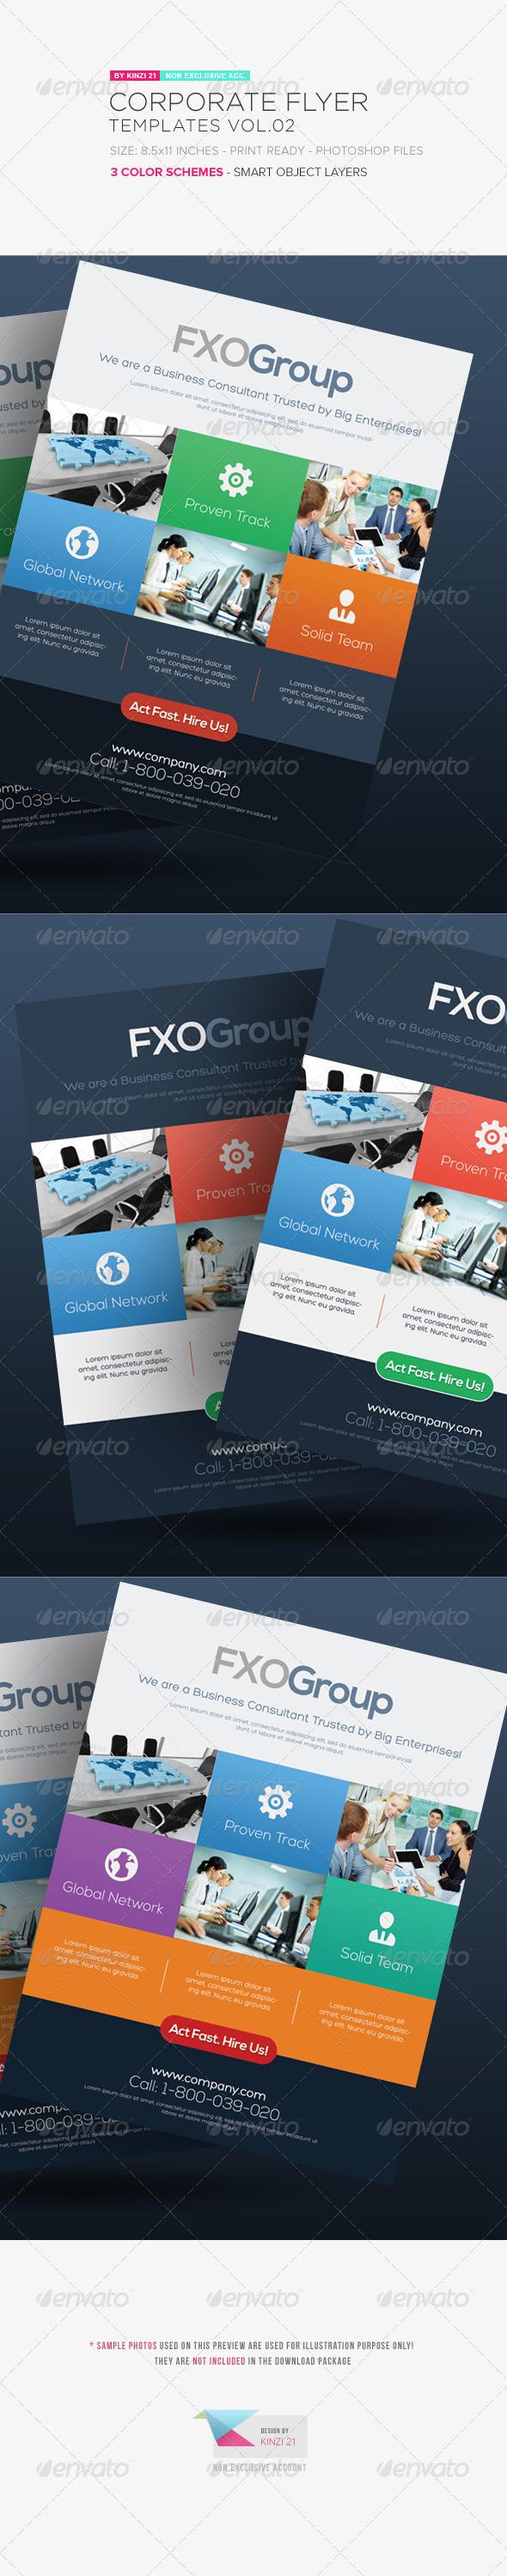 GraphicRiver Corporate Flyer Templates Vol.02 5472859